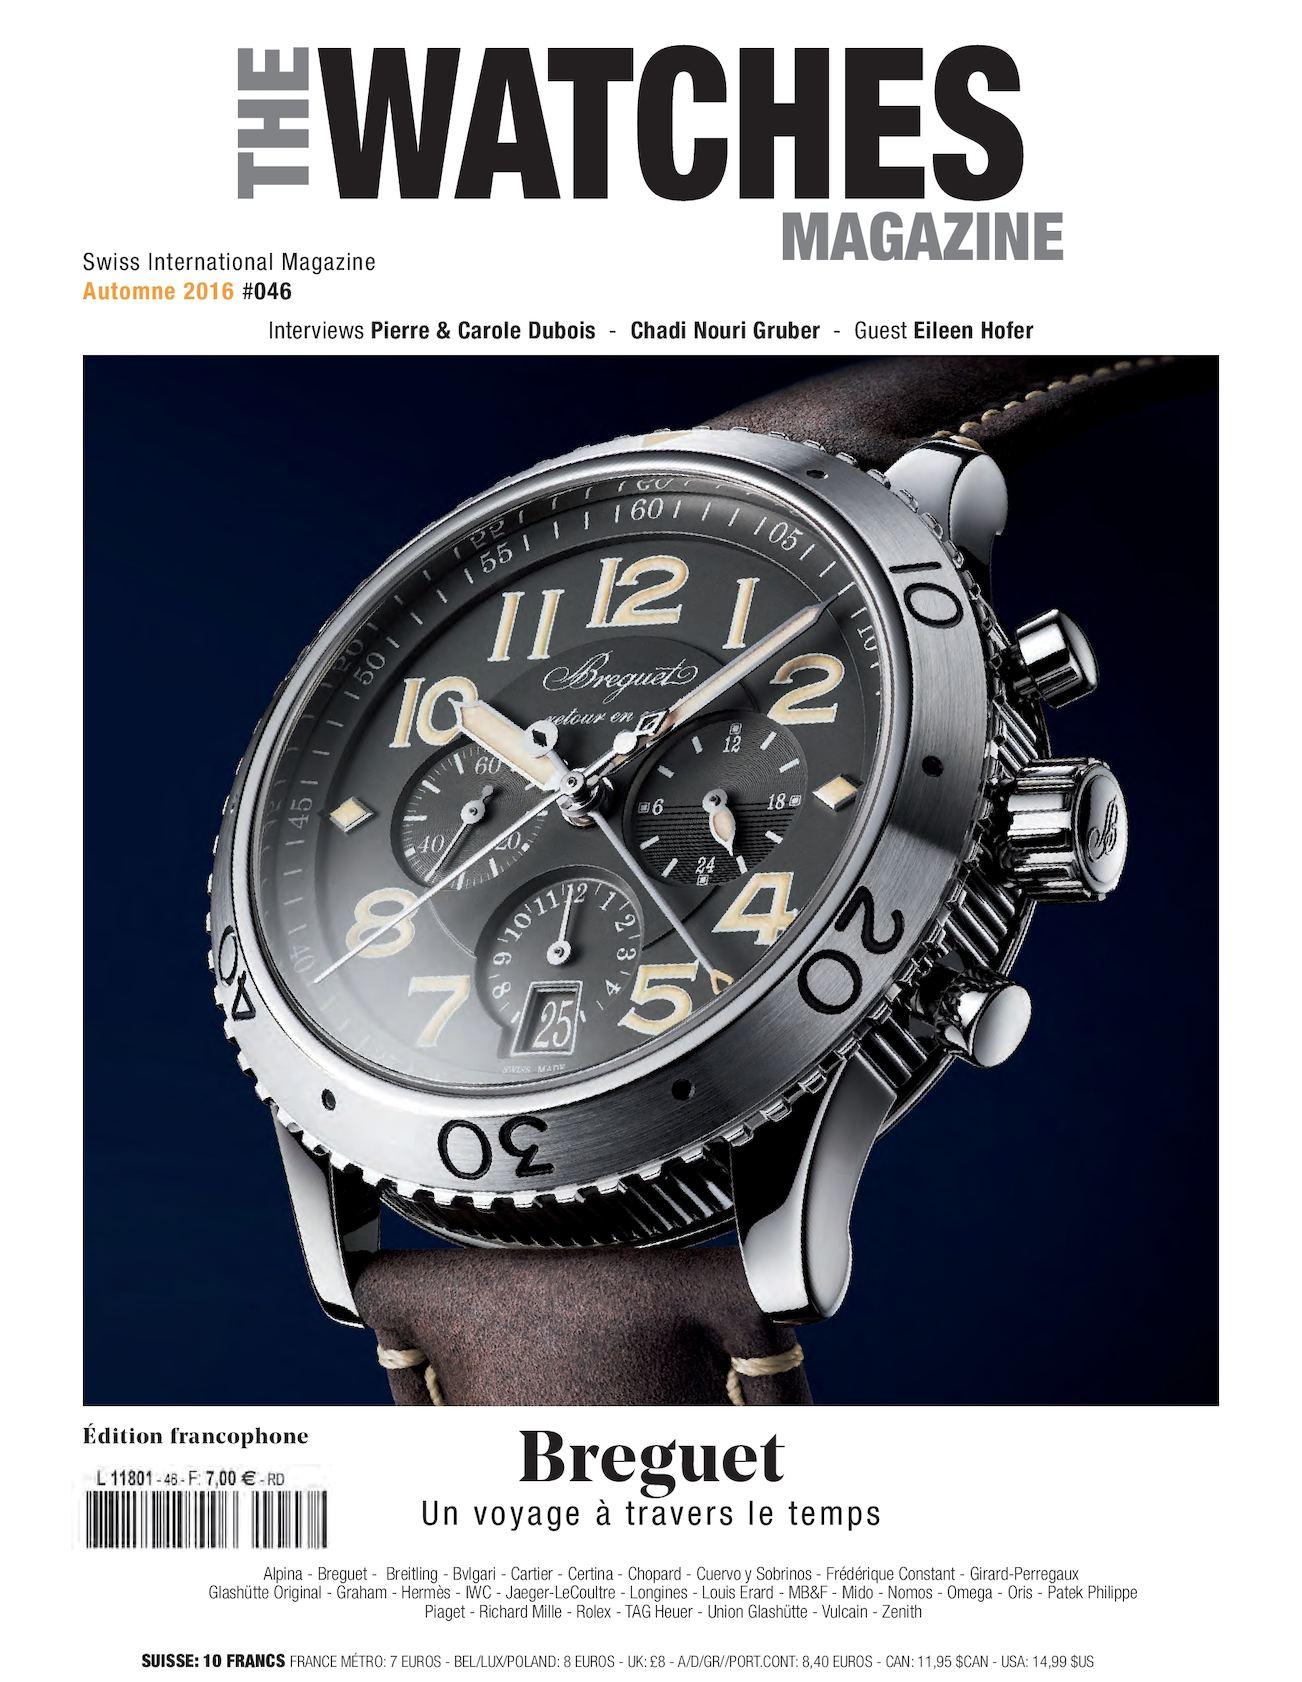 848fa7c4d0da8 Calaméo - The Watches Magazine  046 FR